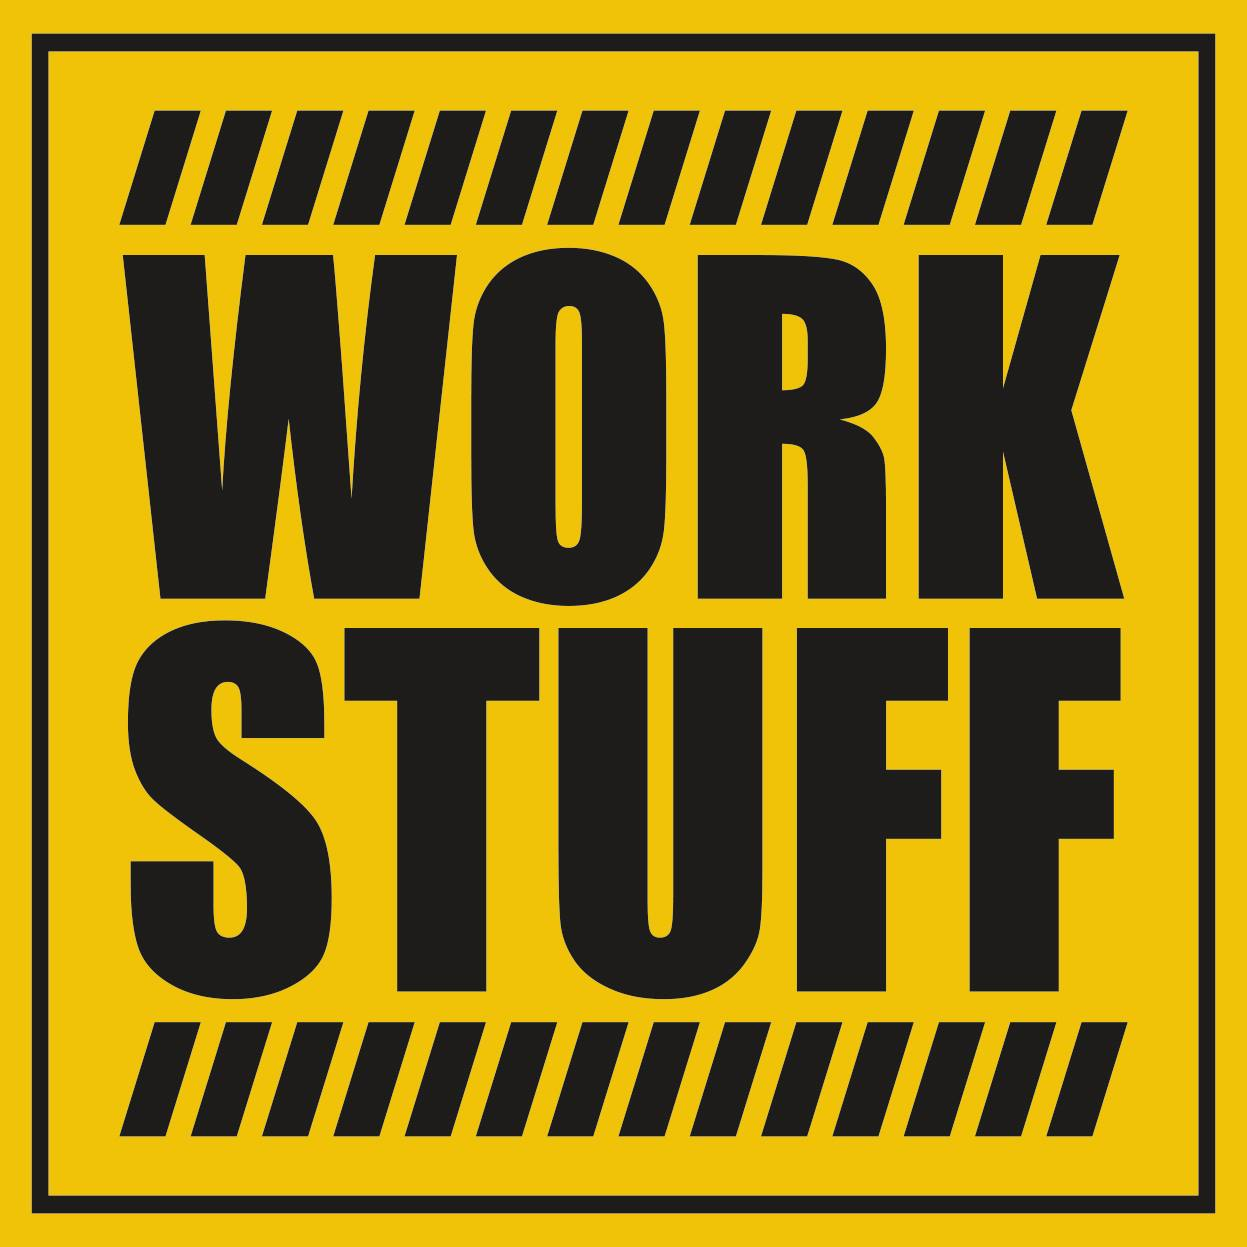 Work Stuff logo - DetailingWiki, the free wiki for detailers